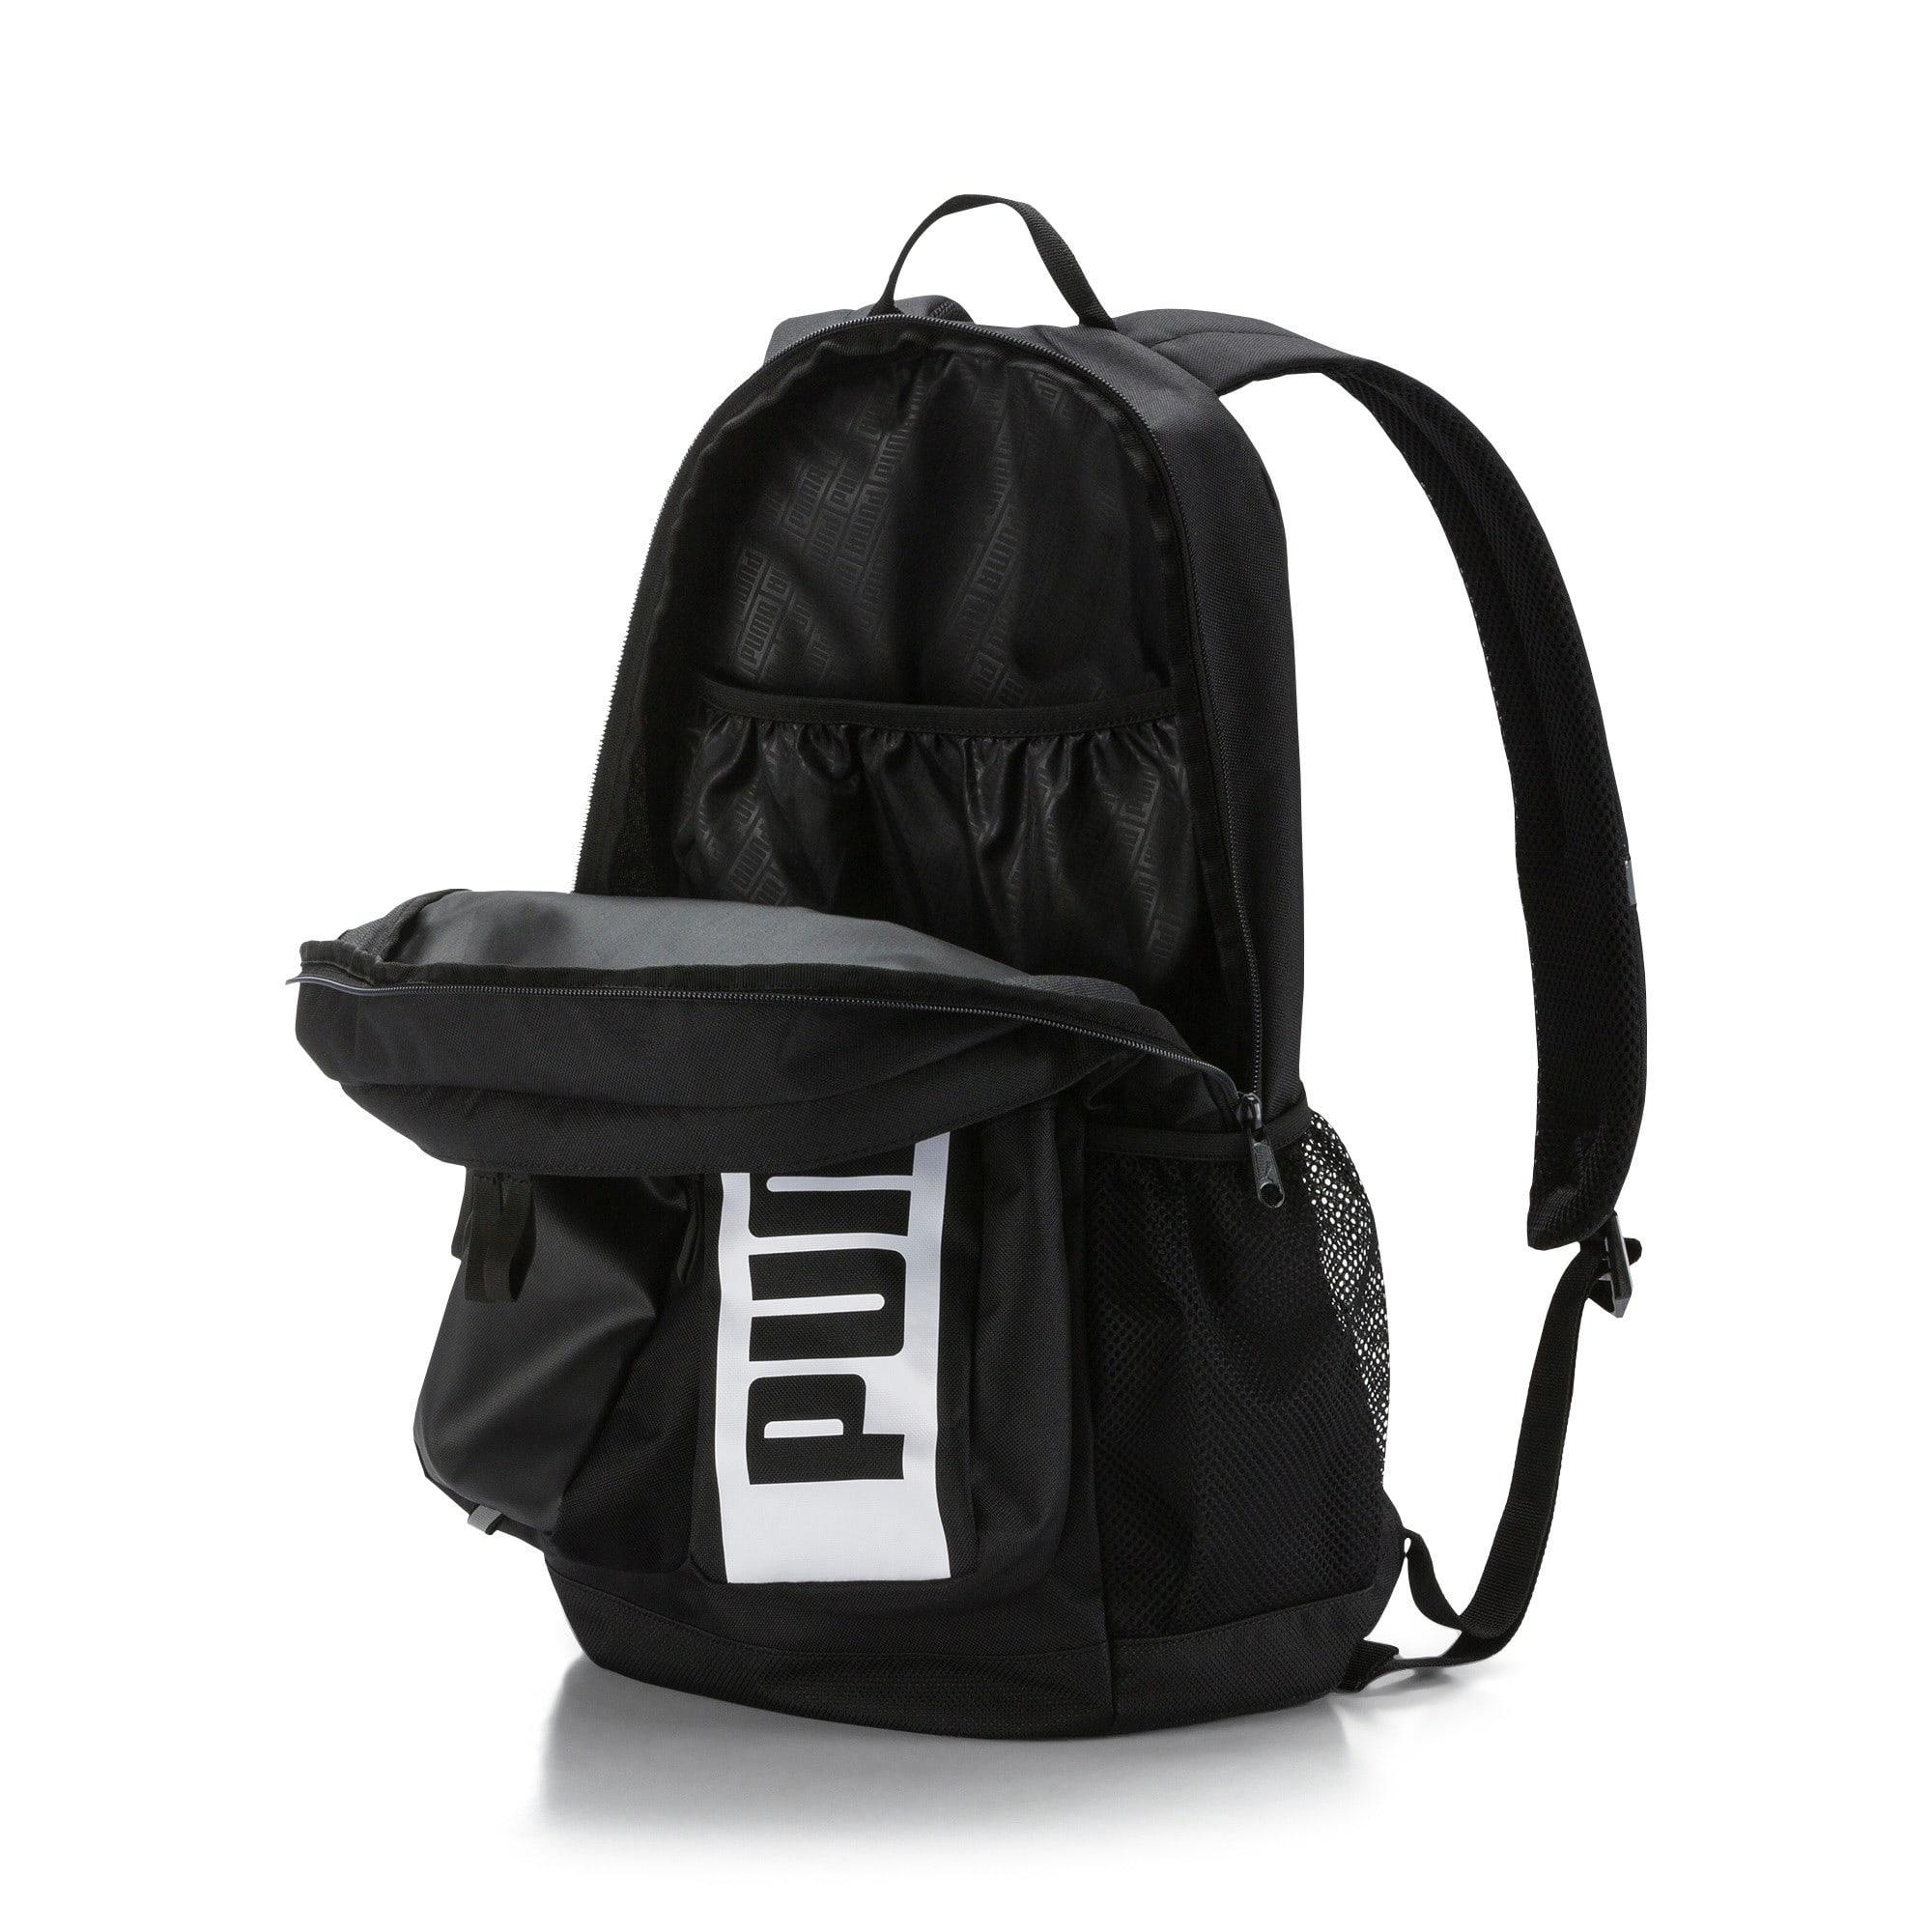 Thumbnail 4 of Deck Backpack II, Puma Black, medium-IND